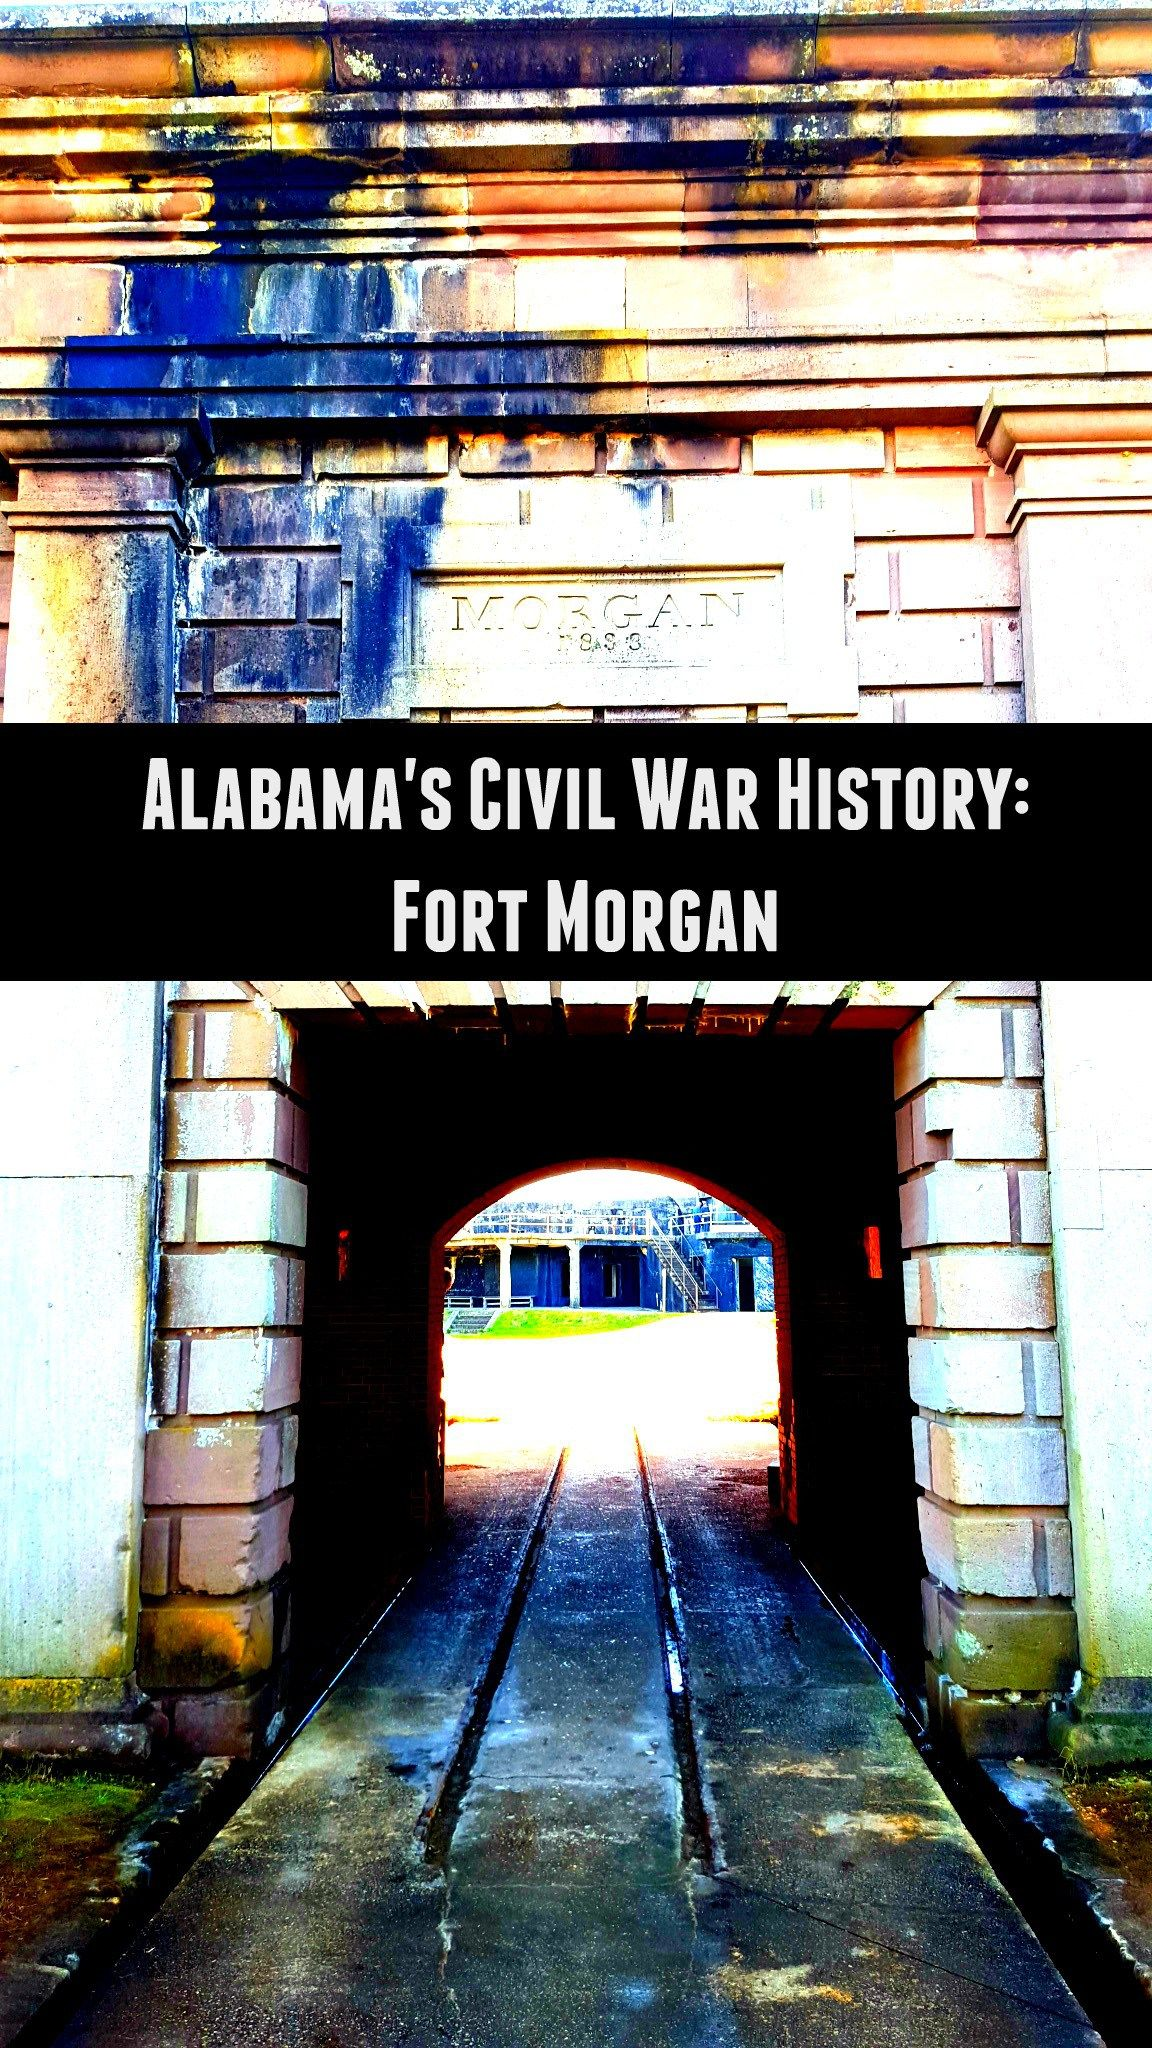 Alabama's Civil War History: Fort Morgan